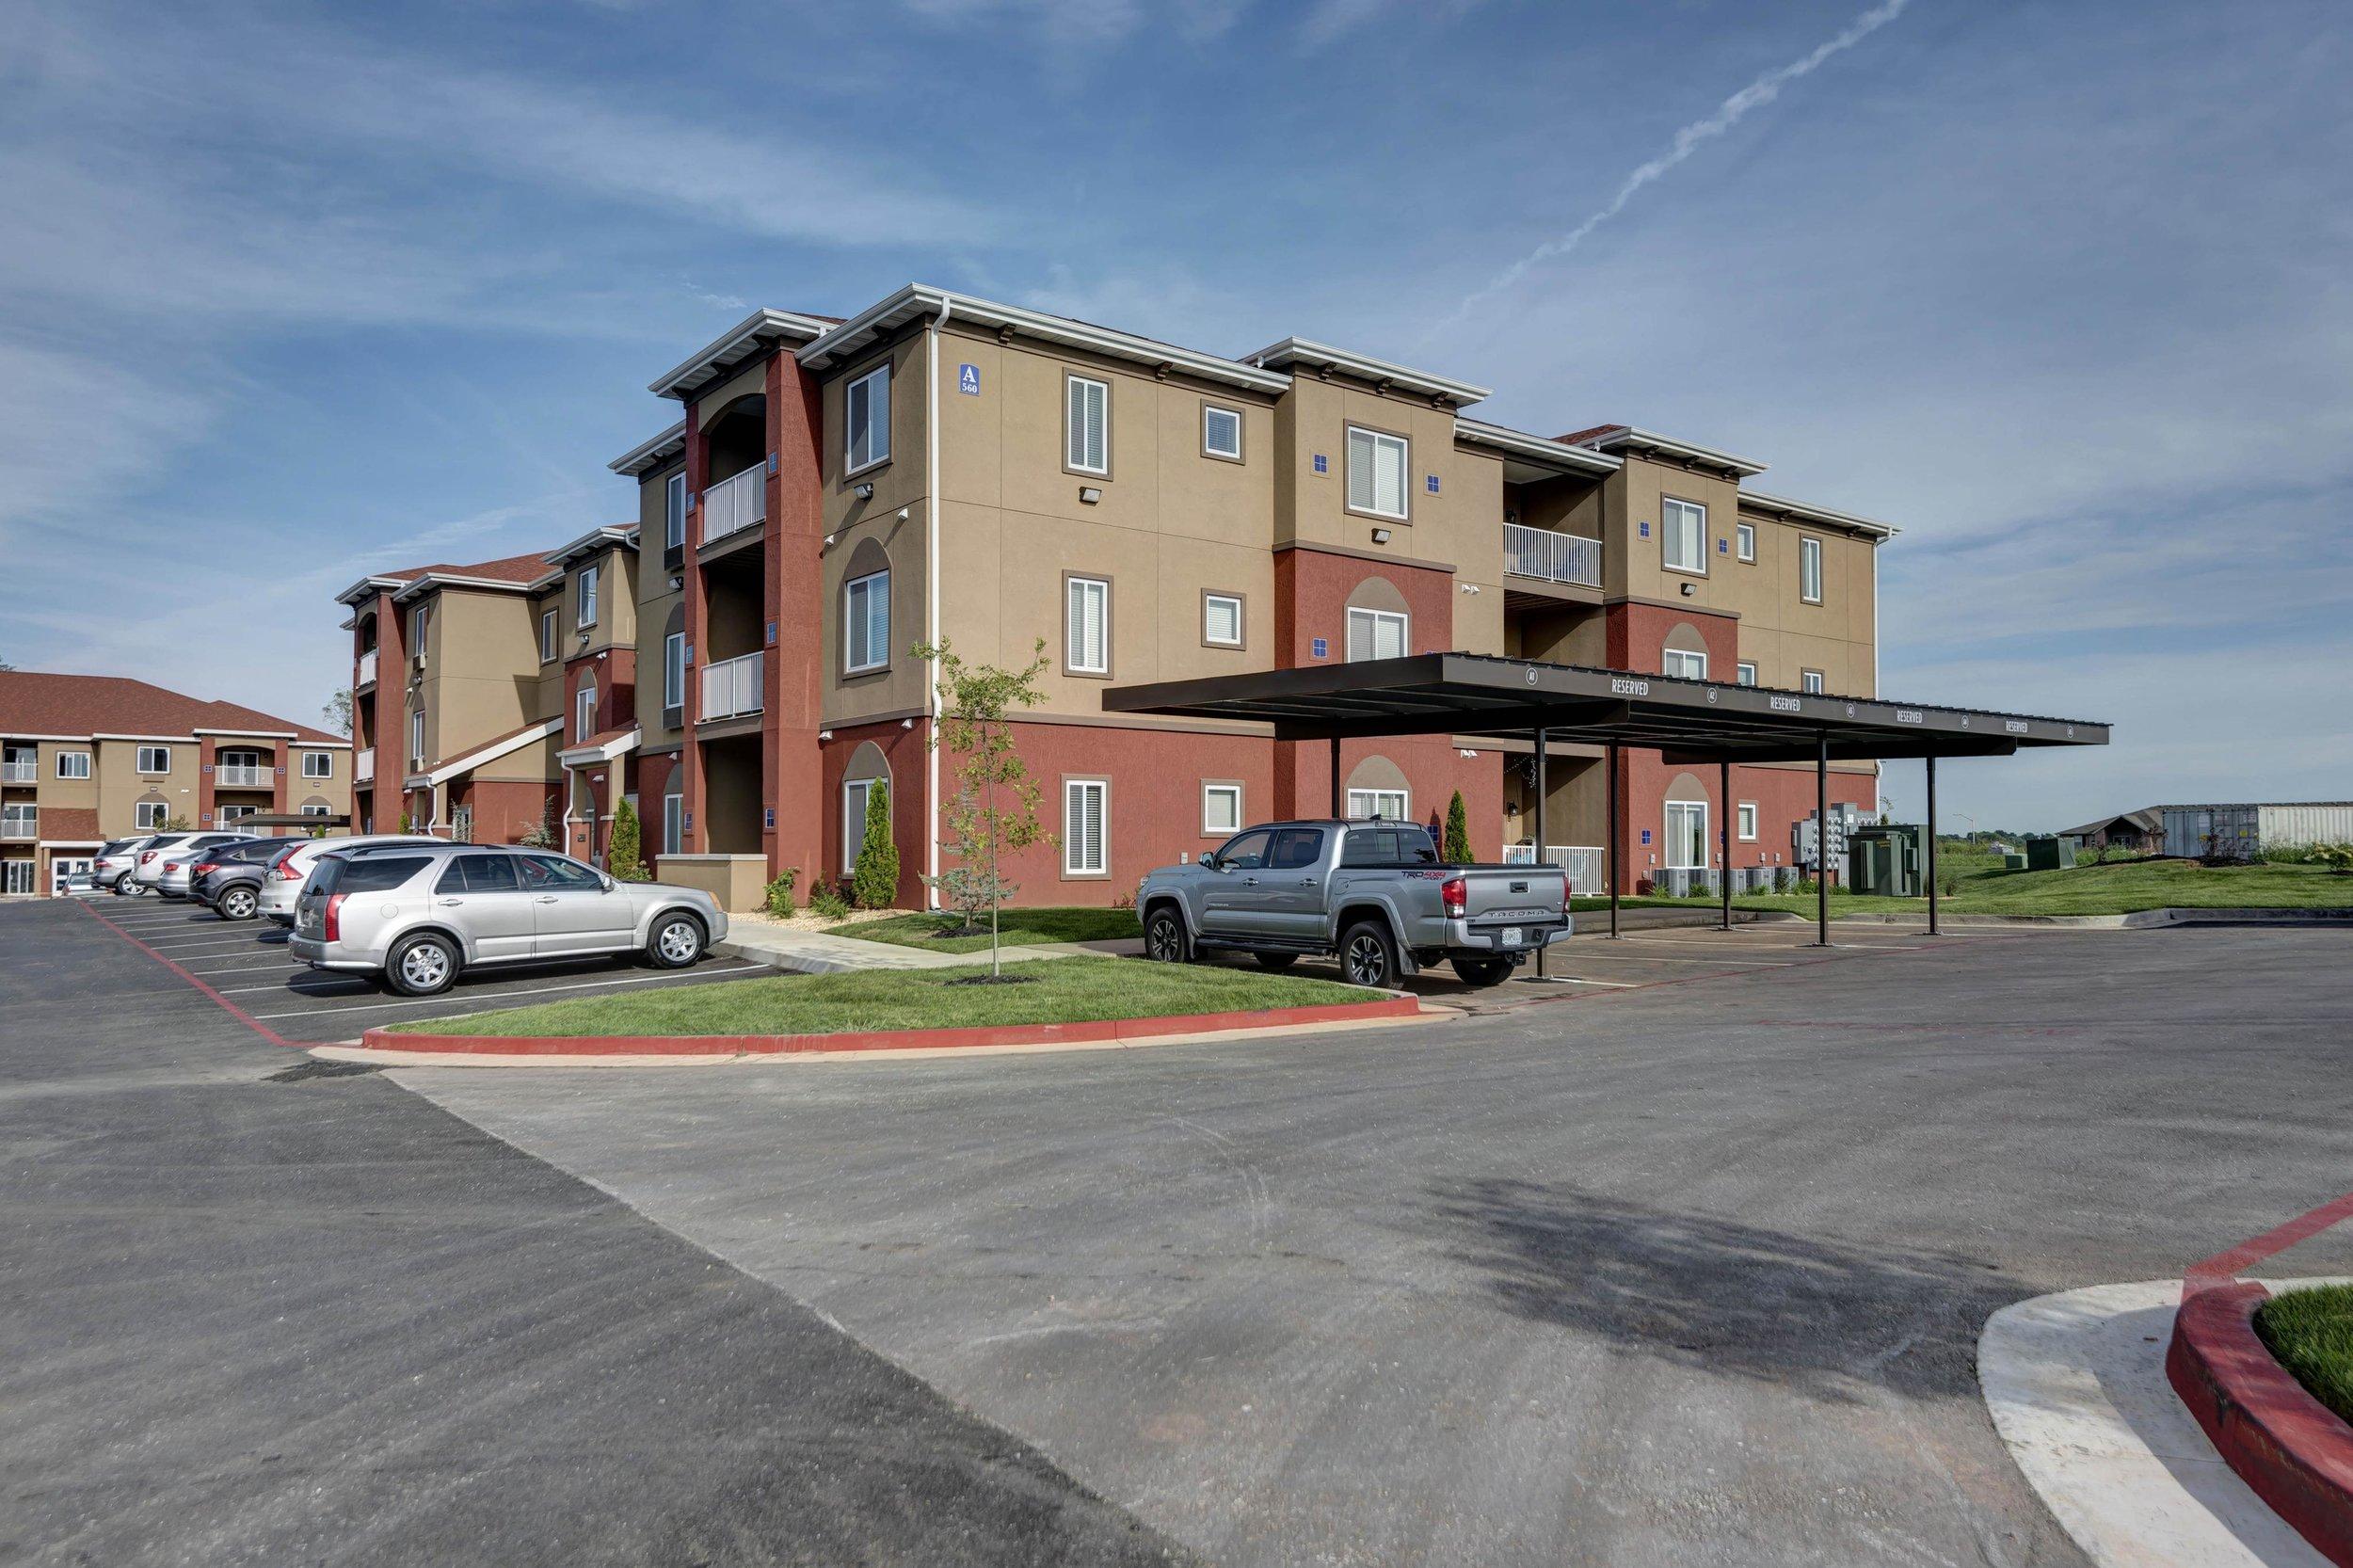 VERANDAS - 560 W. Bryant Street (5.78 mi)Springfield, Missouri 65810